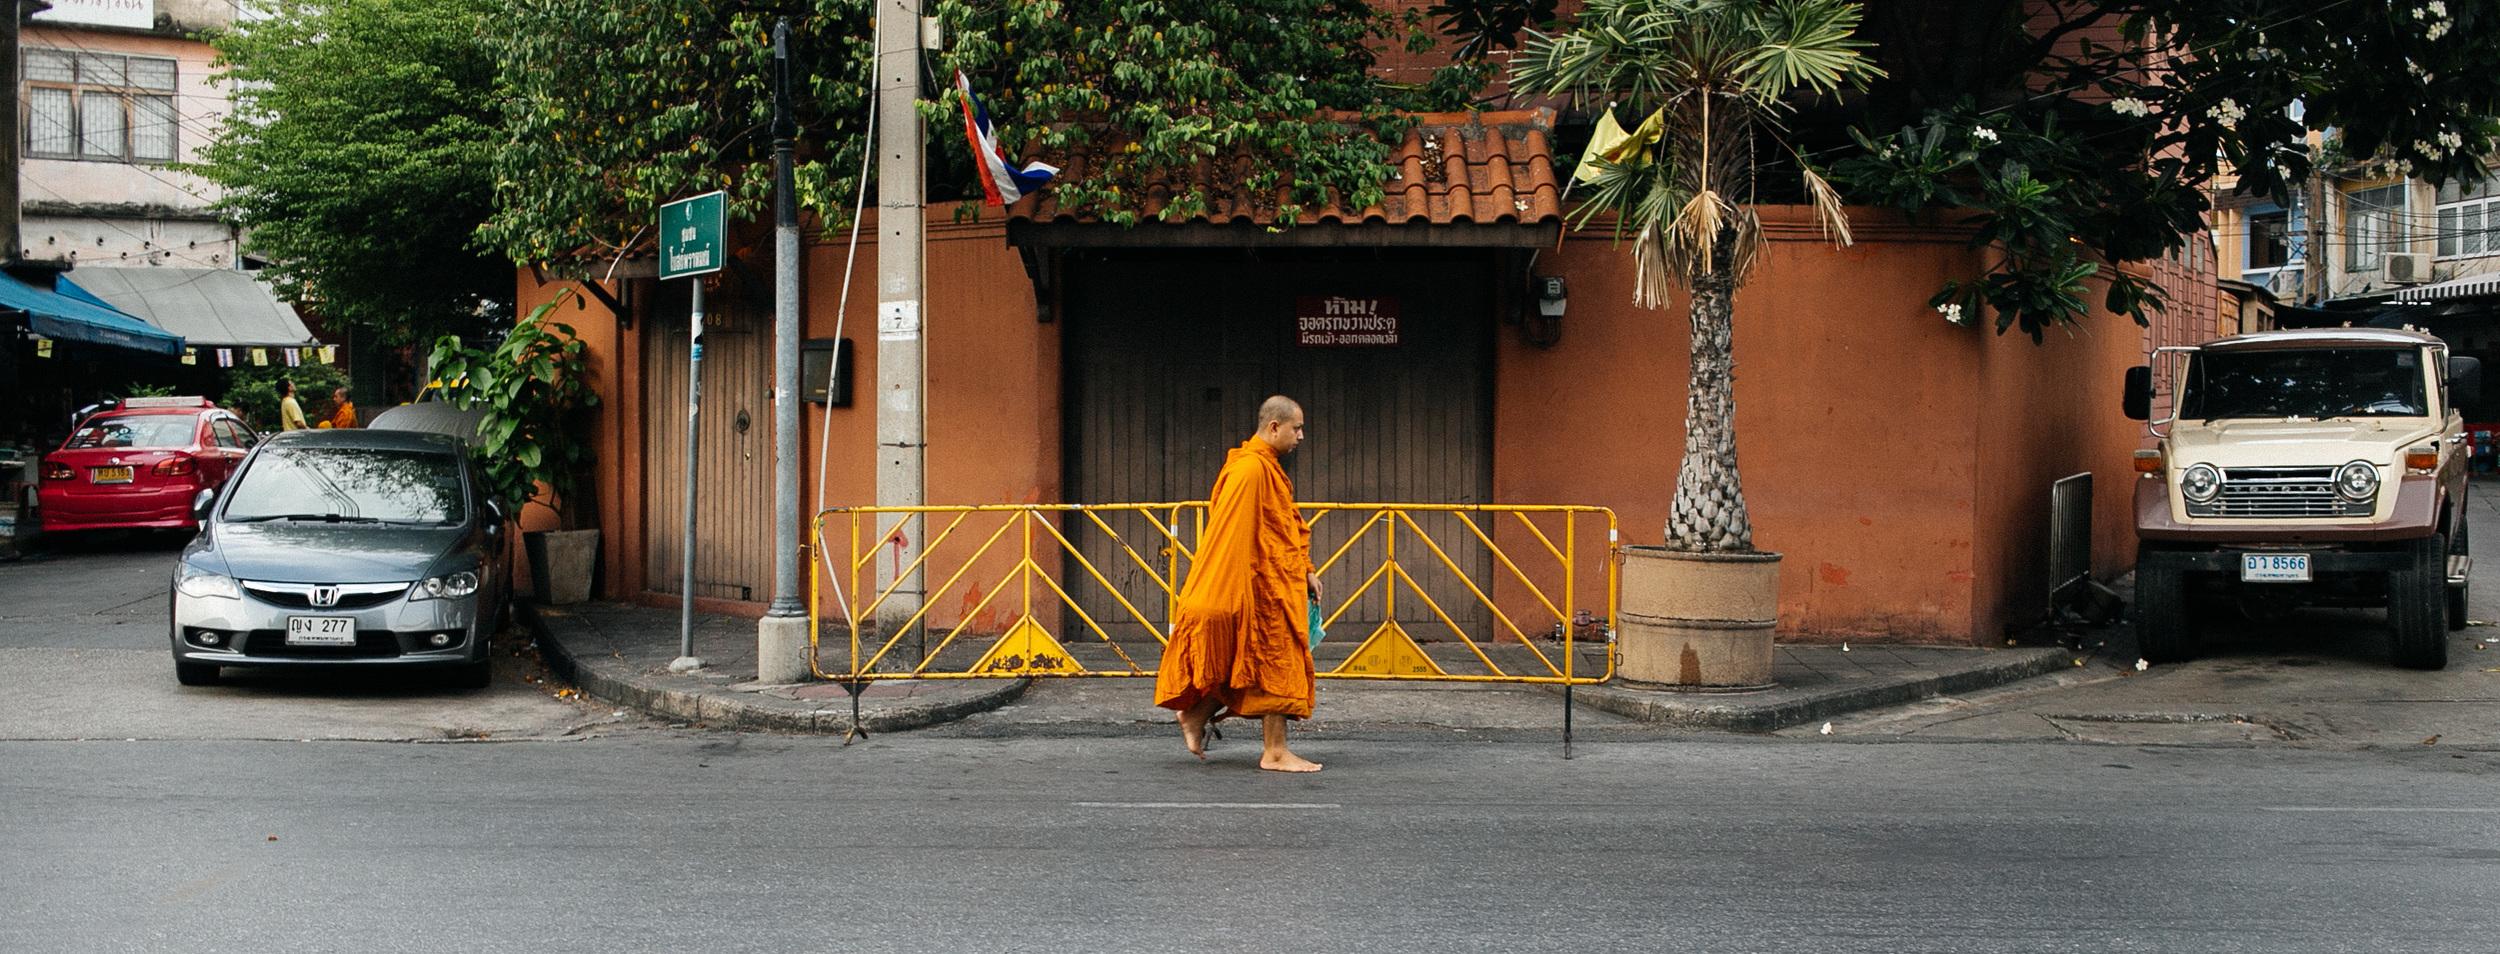 Bangkok 389A9973.jpg